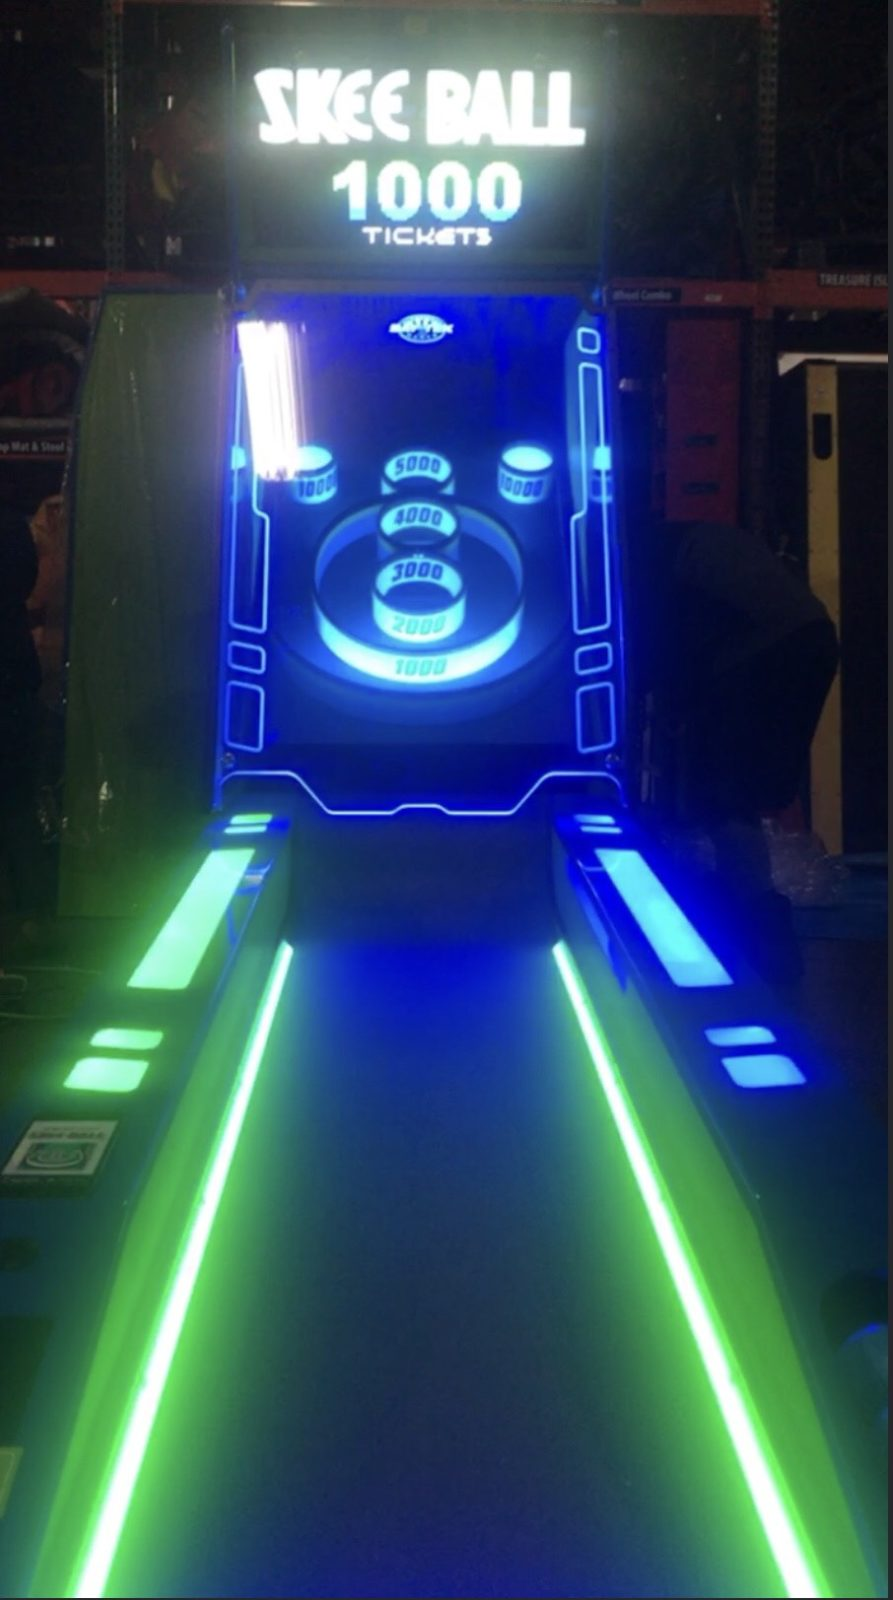 Skee ball machine rental